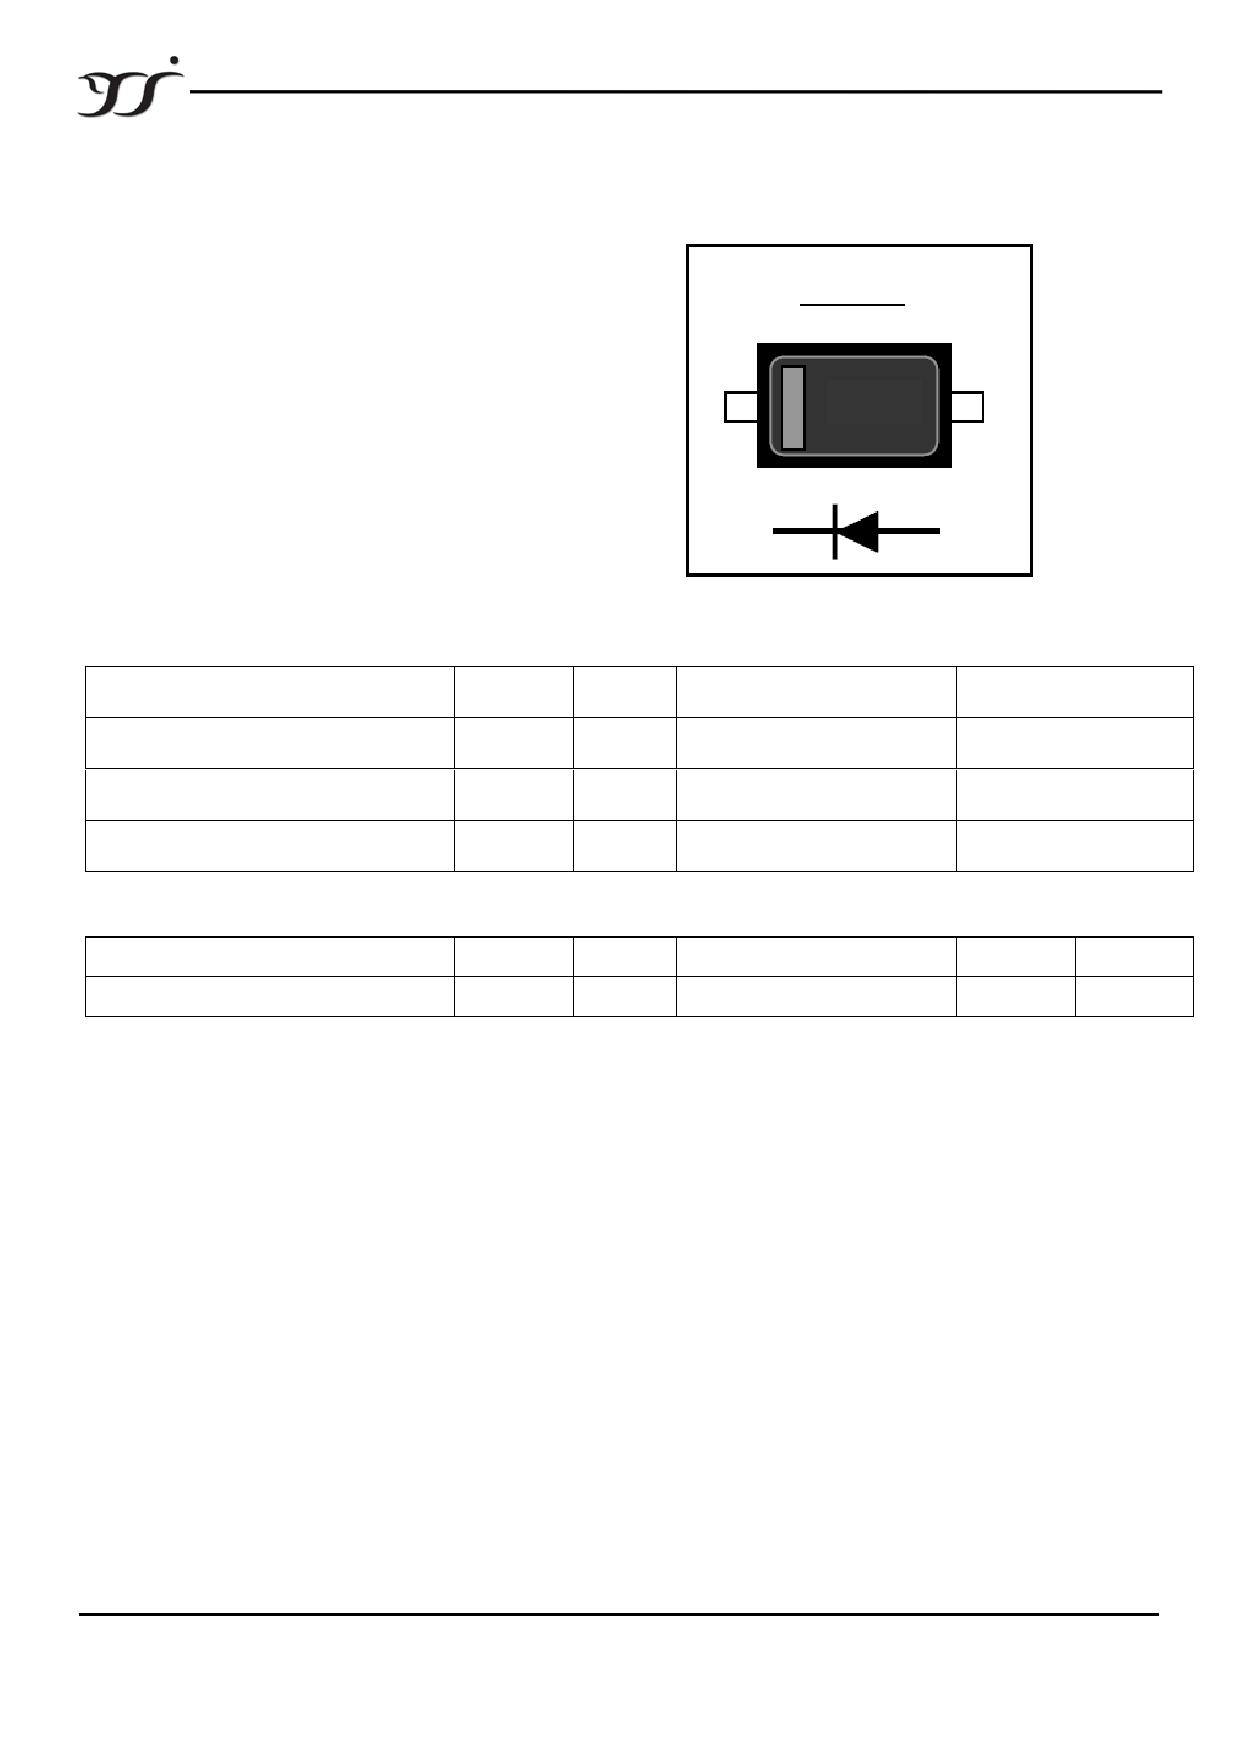 MMSZ5256B Datasheet